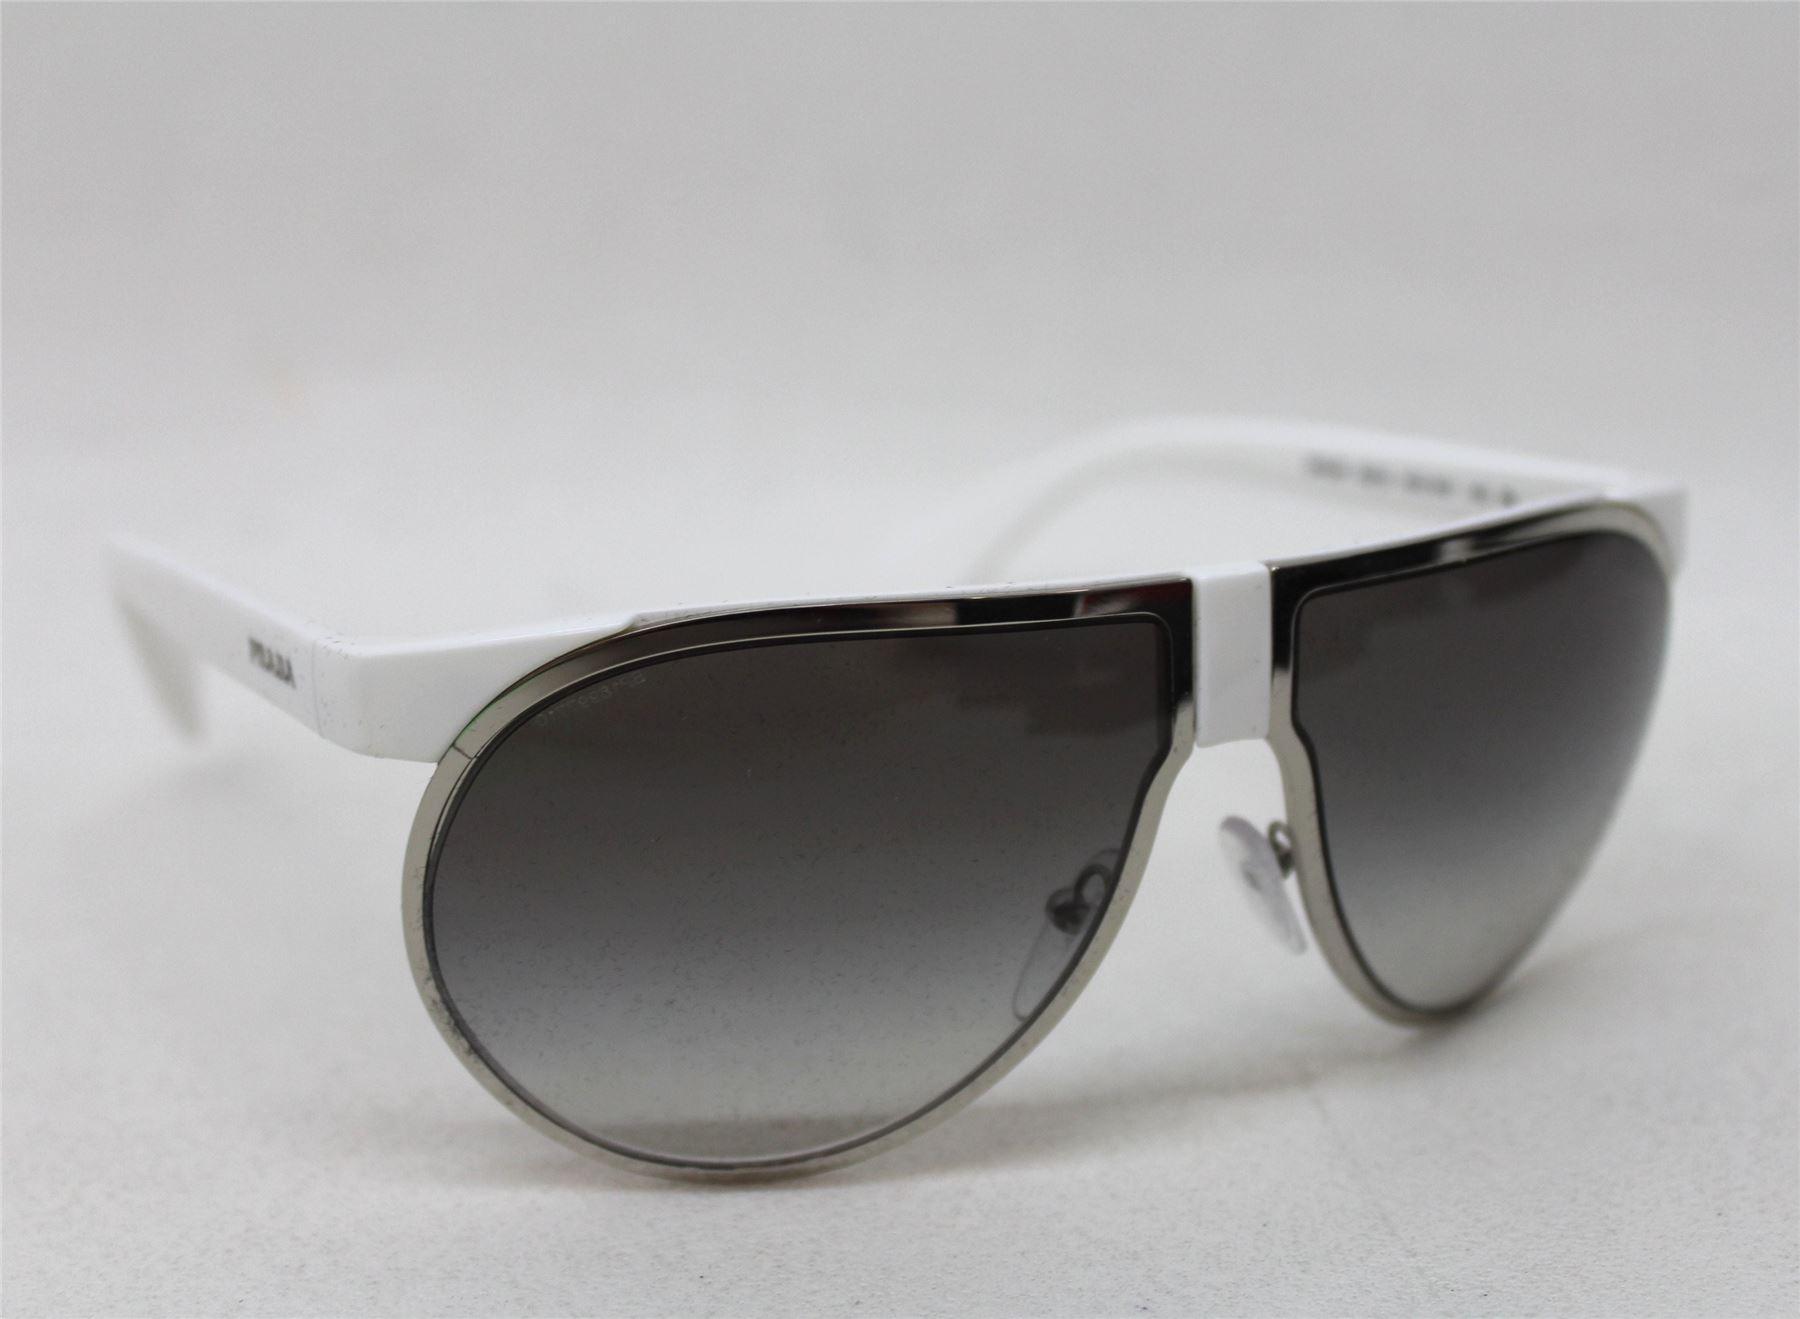 b6a5c6b6487 Prada Studded Shield Sunglasses